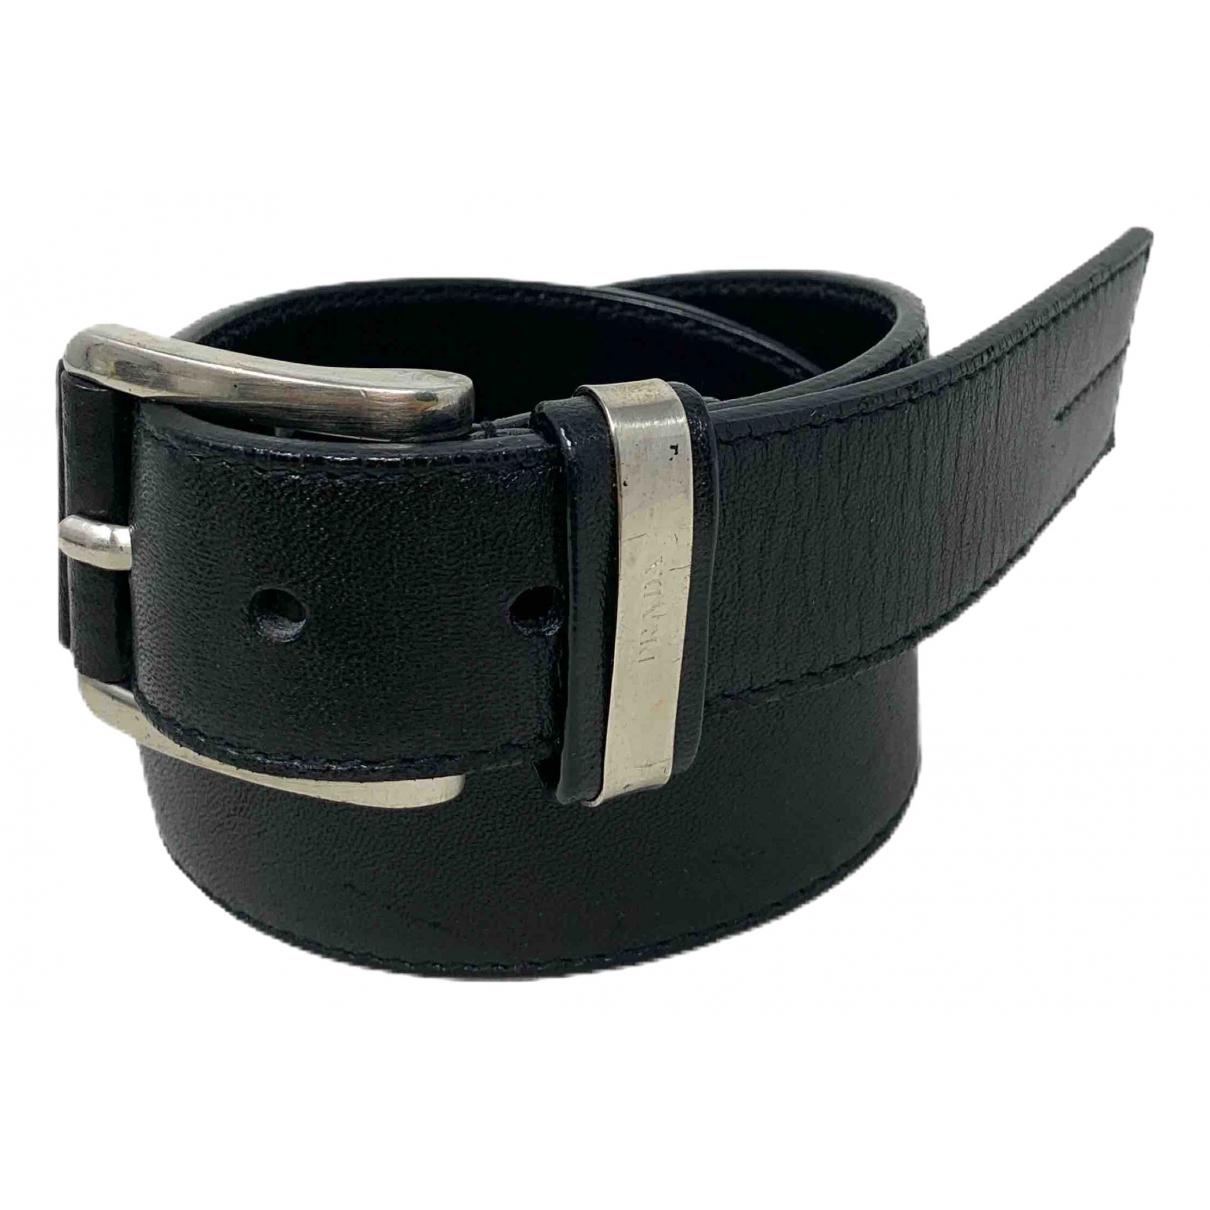 Prada \N Black Leather belt for Women 85 cm